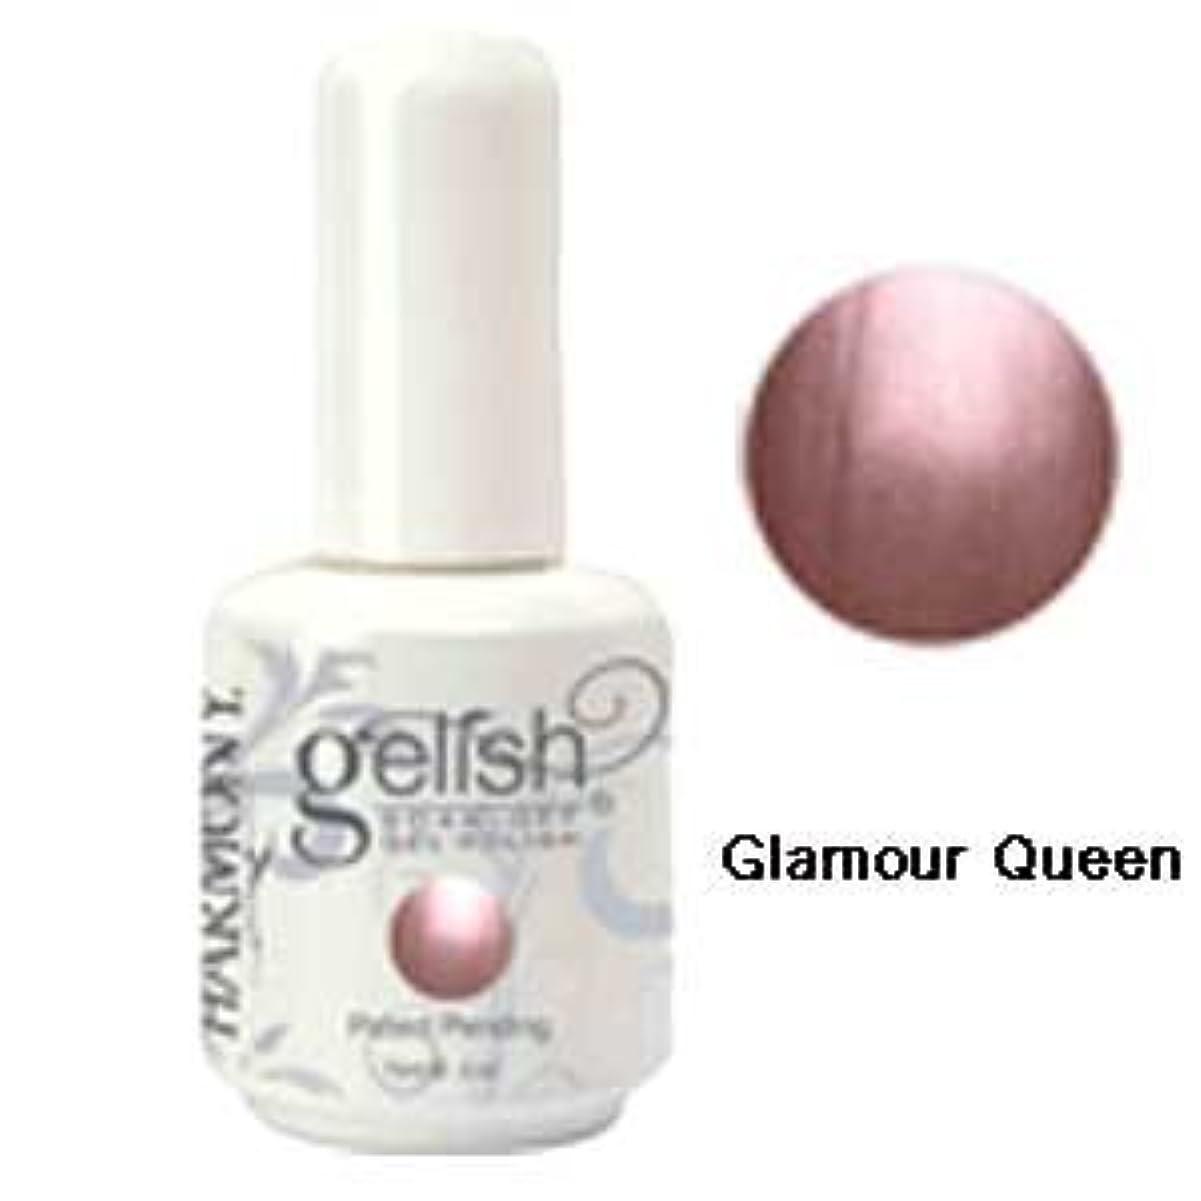 Harmony gelishソークオフジェル-Glamour Queen 15ml [海外直送品][並行輸入品]